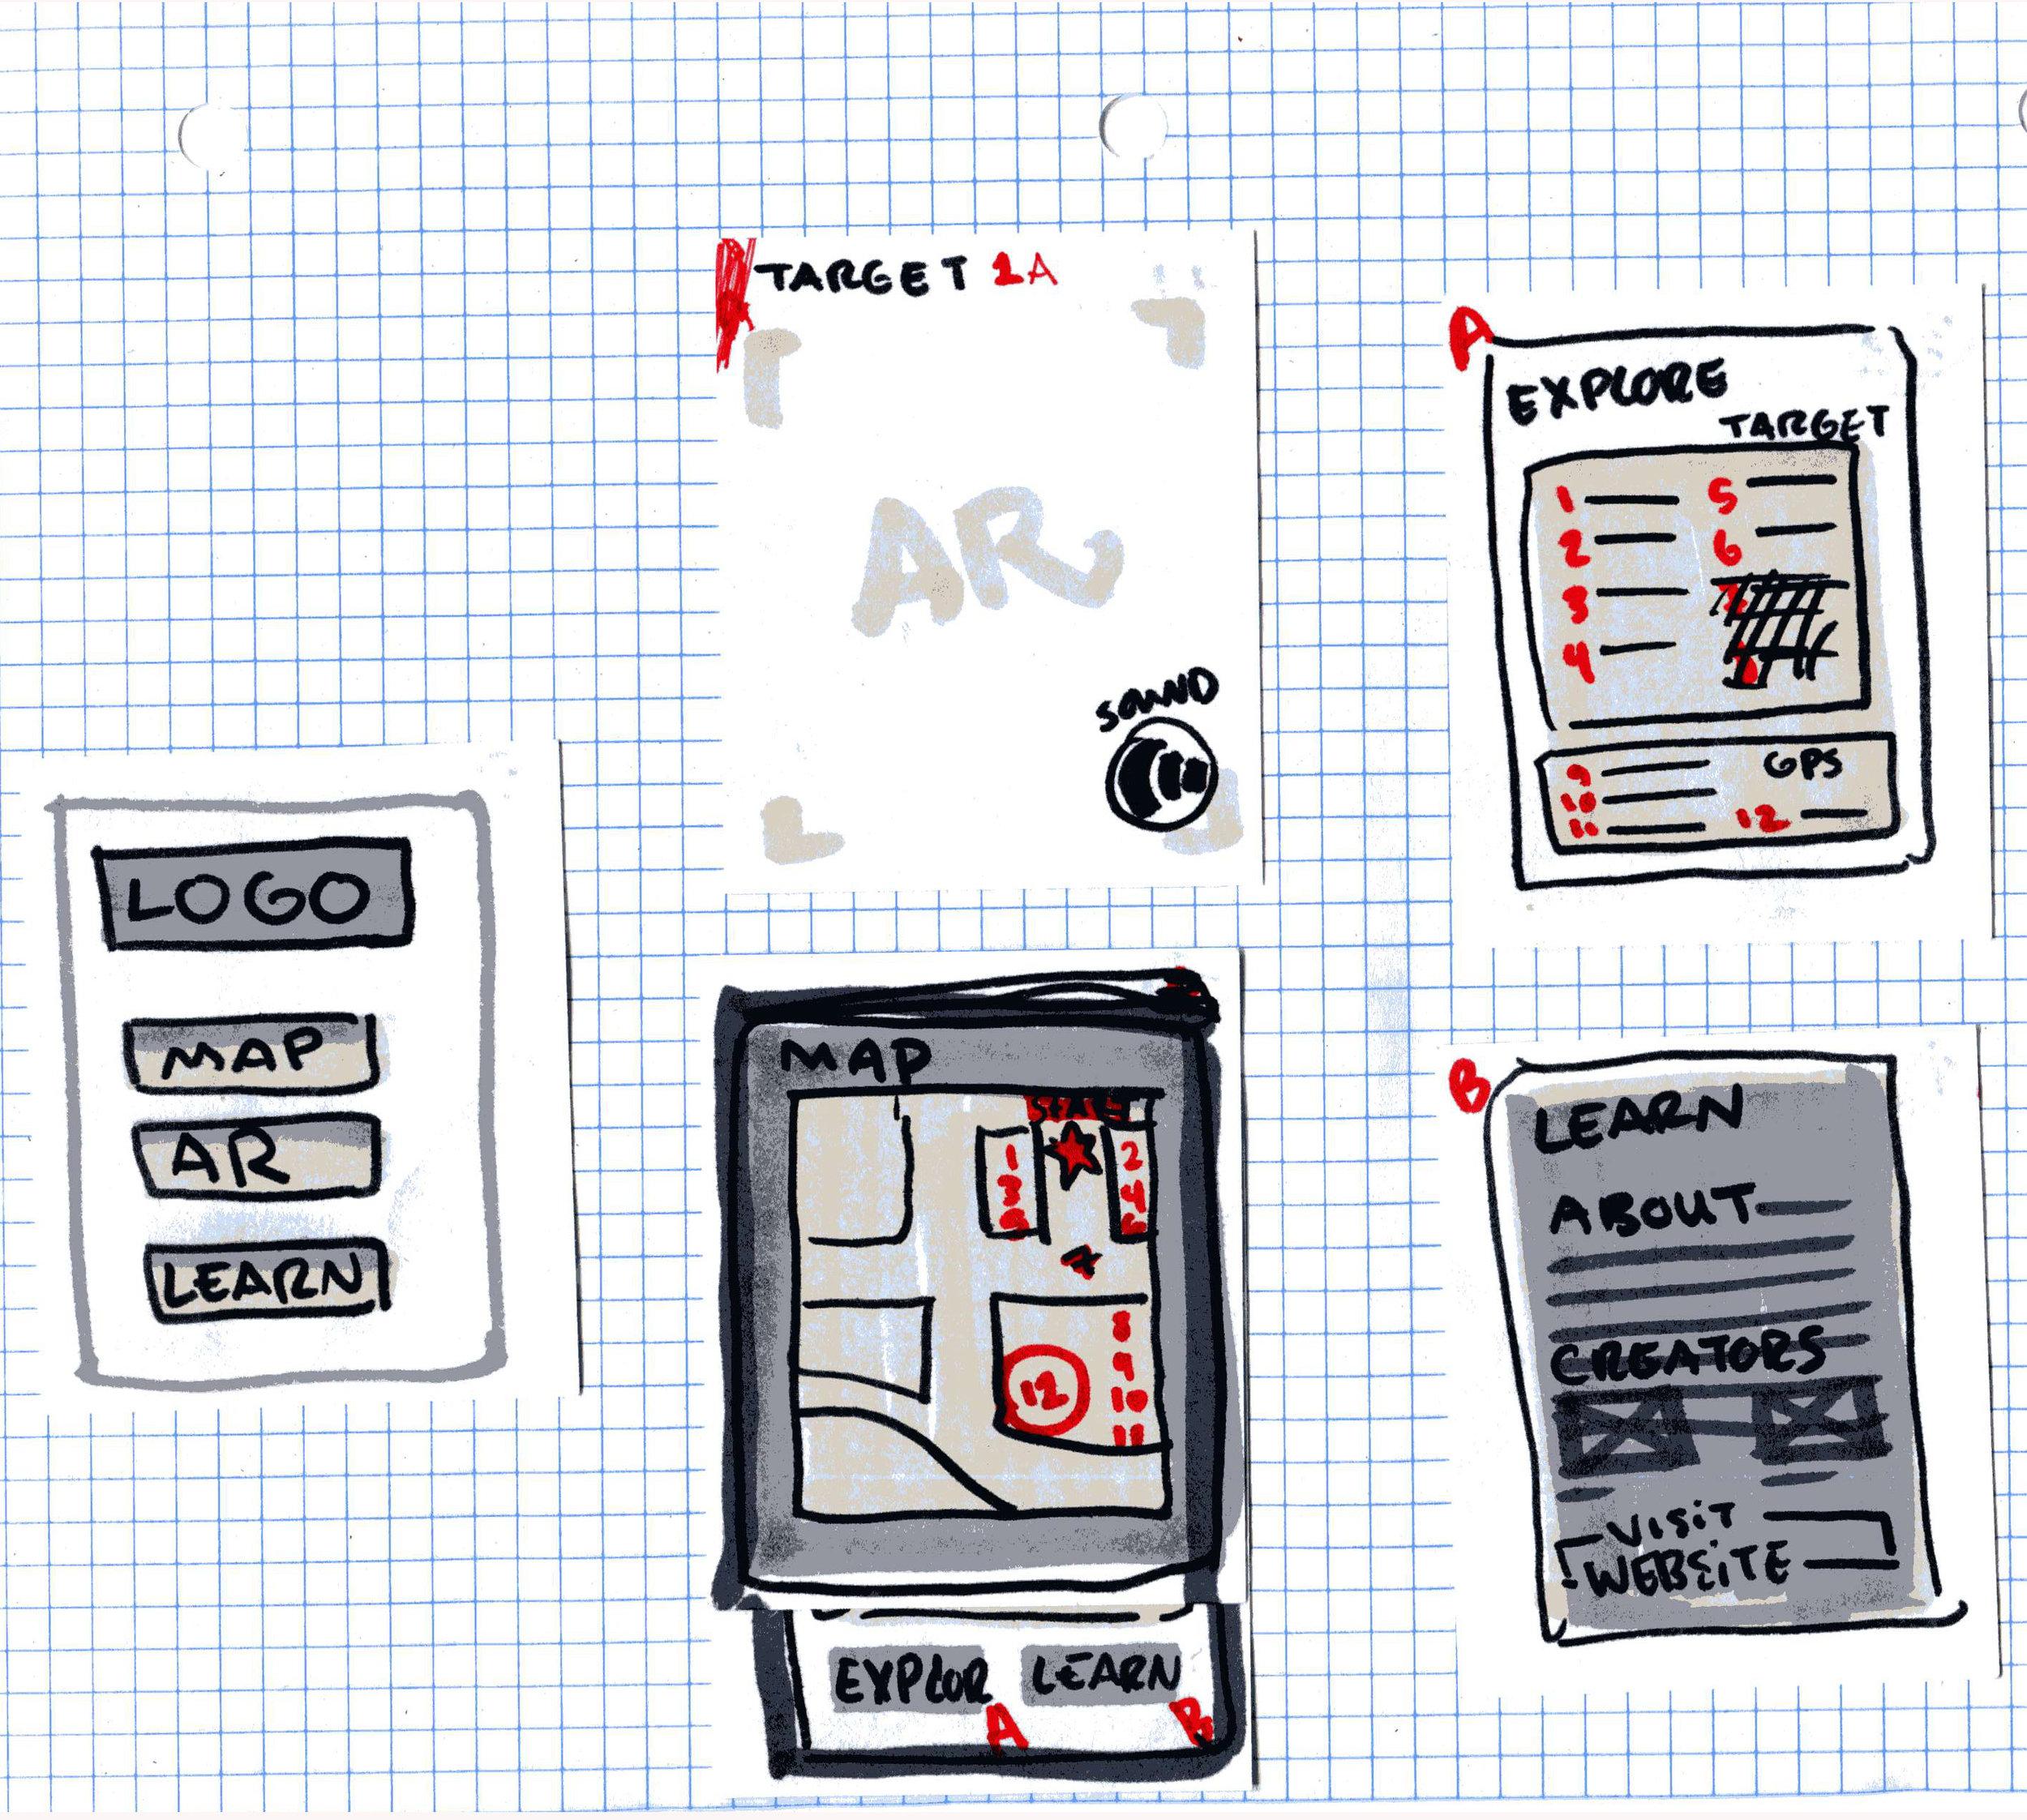 paper_proto_ohlone.jpg